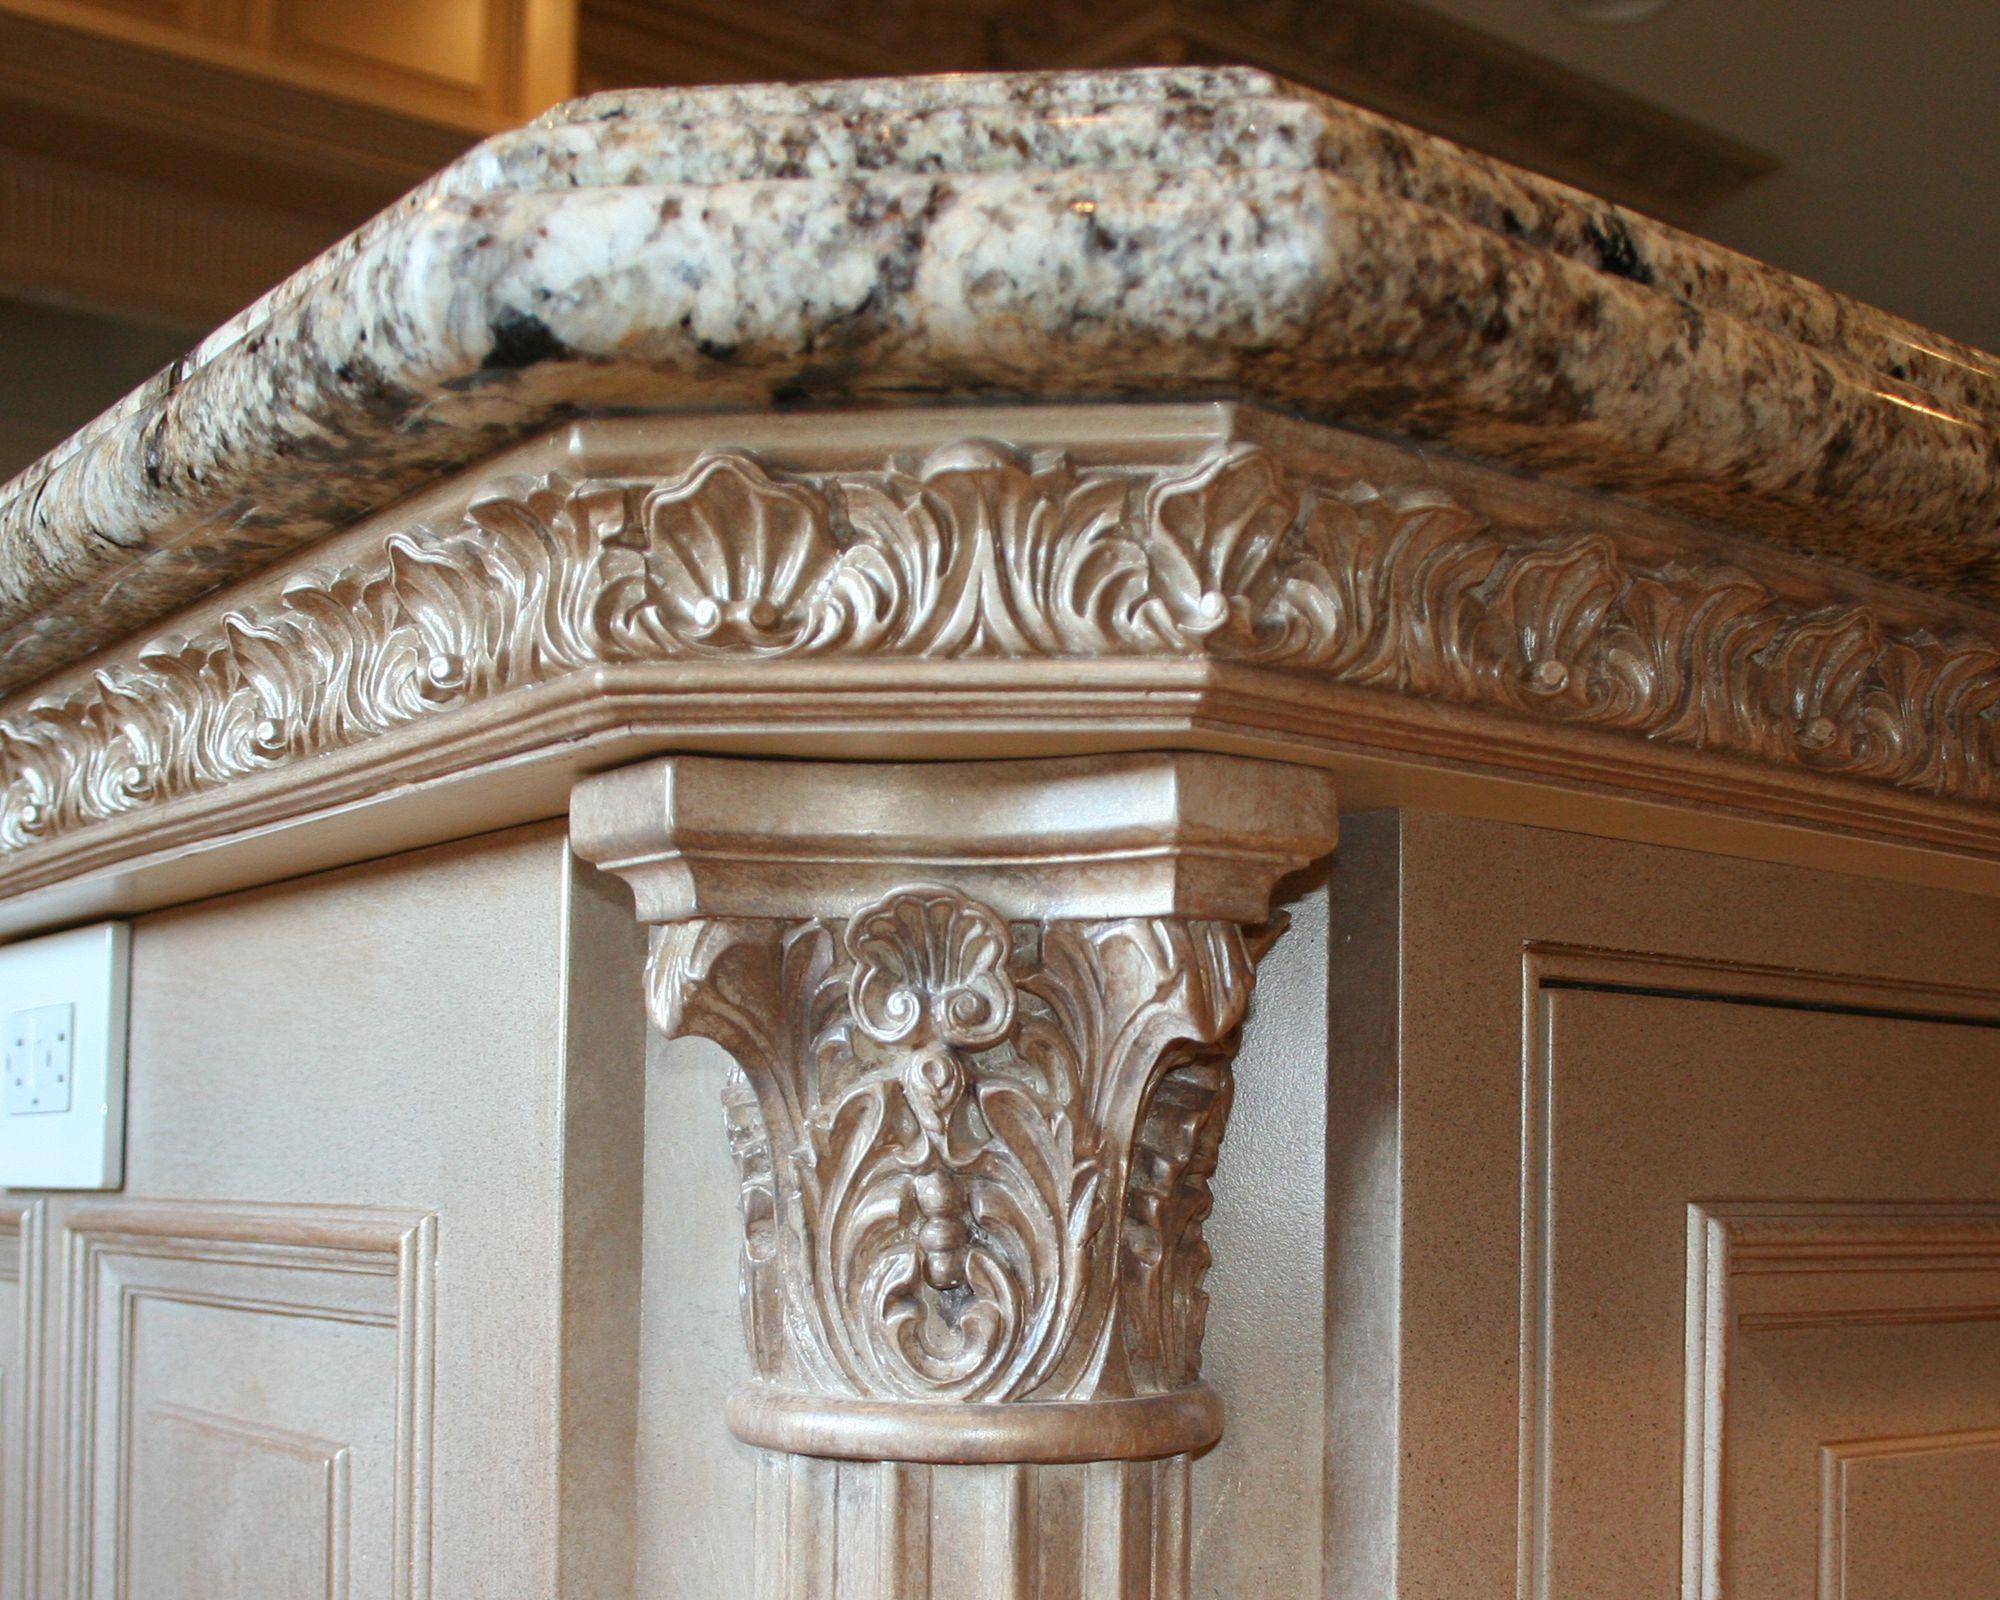 ornate kitchen cabinets | Cabinet details | Lantz Custom Woodworking ...